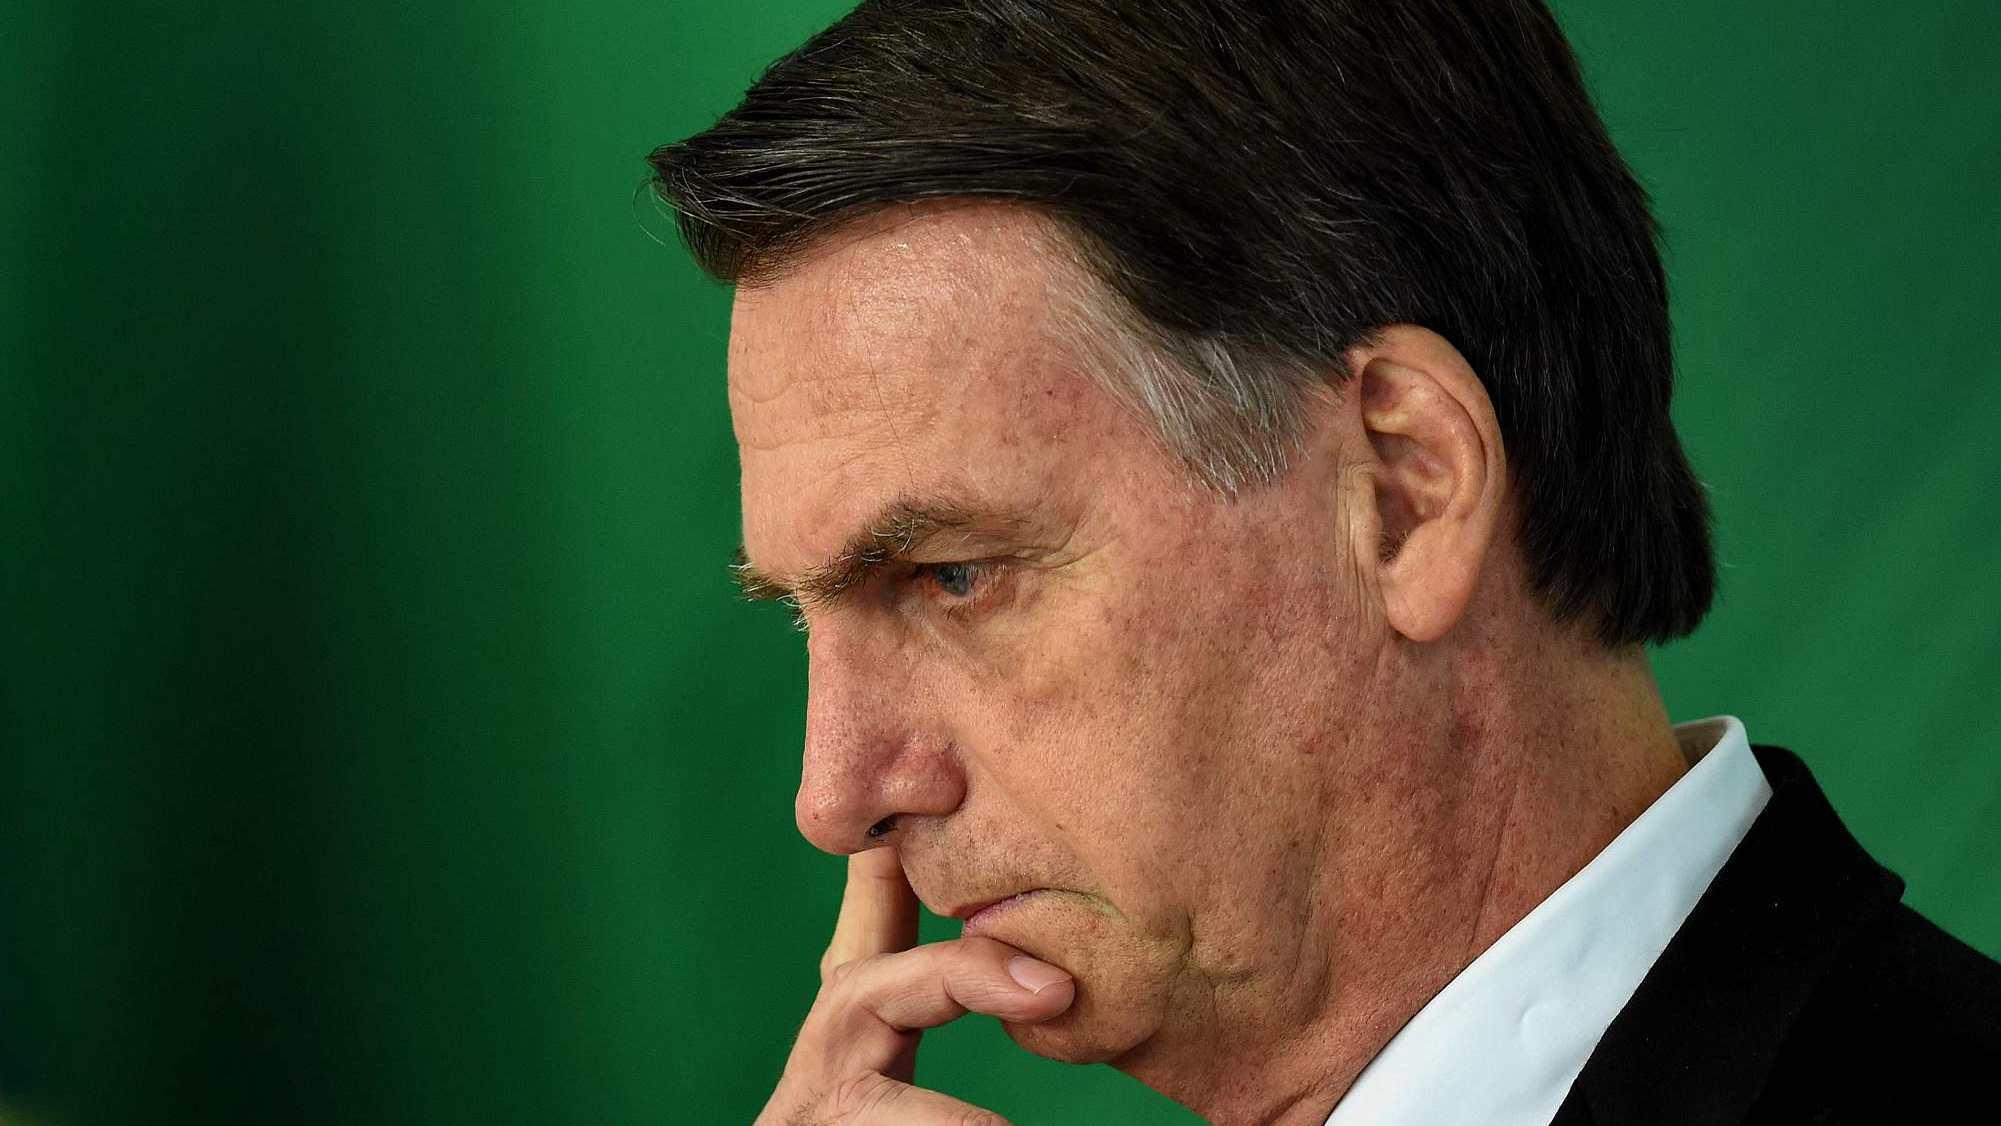 Bolsonaro's inauguration: A party of Brazil's friends?